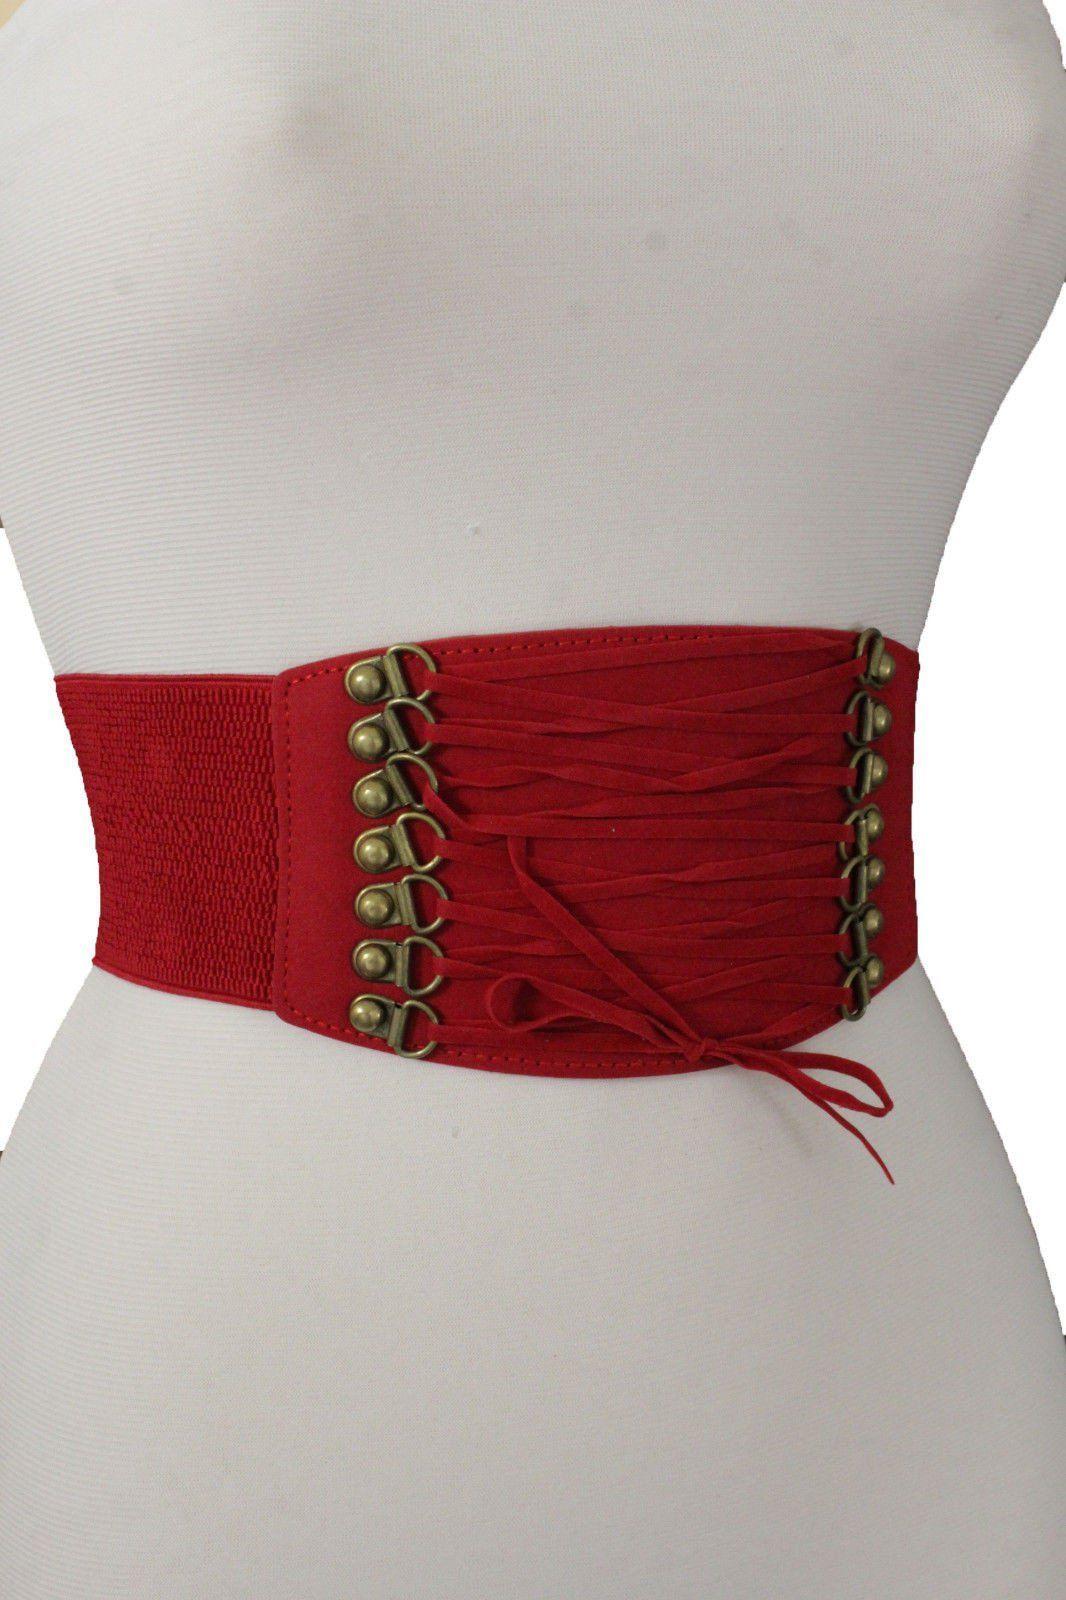 Hot Women Wide Red Faux Leather Elastic Fashion Belt Fancy Gold Metal Buckle S M